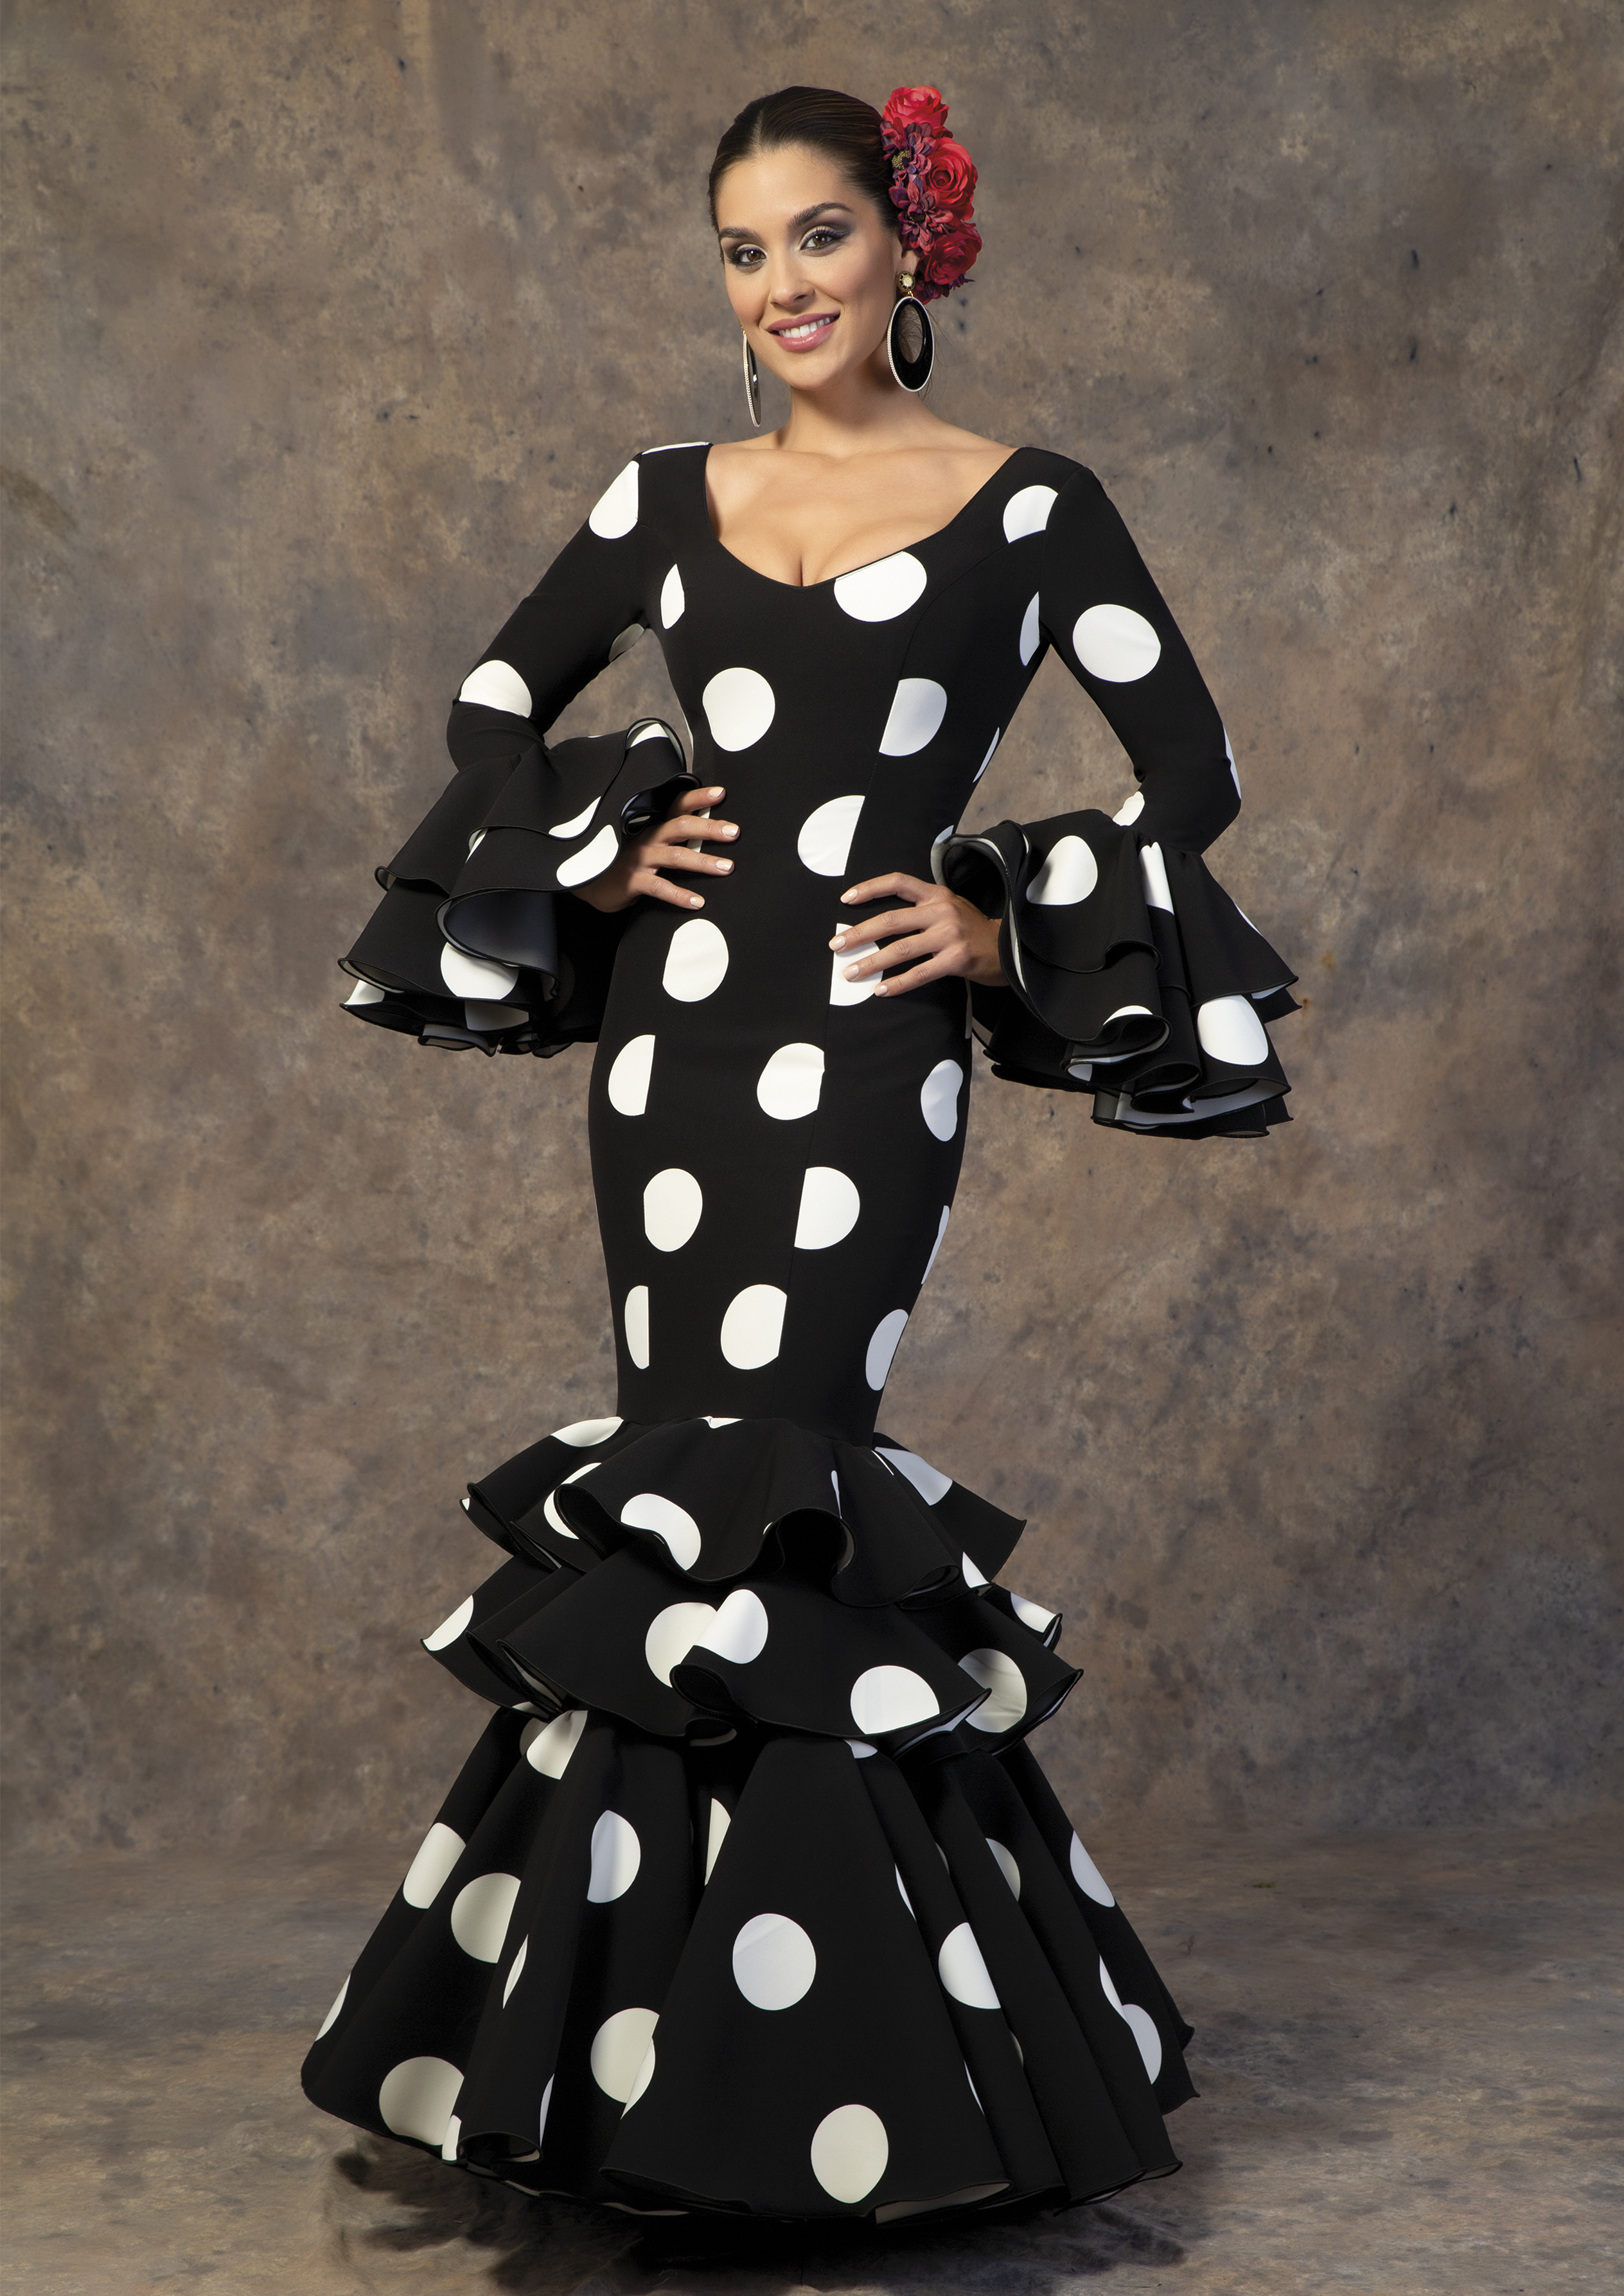 923d798c77c Descubre la Colección 2019 de trajes de flamenca de Aires de Feria